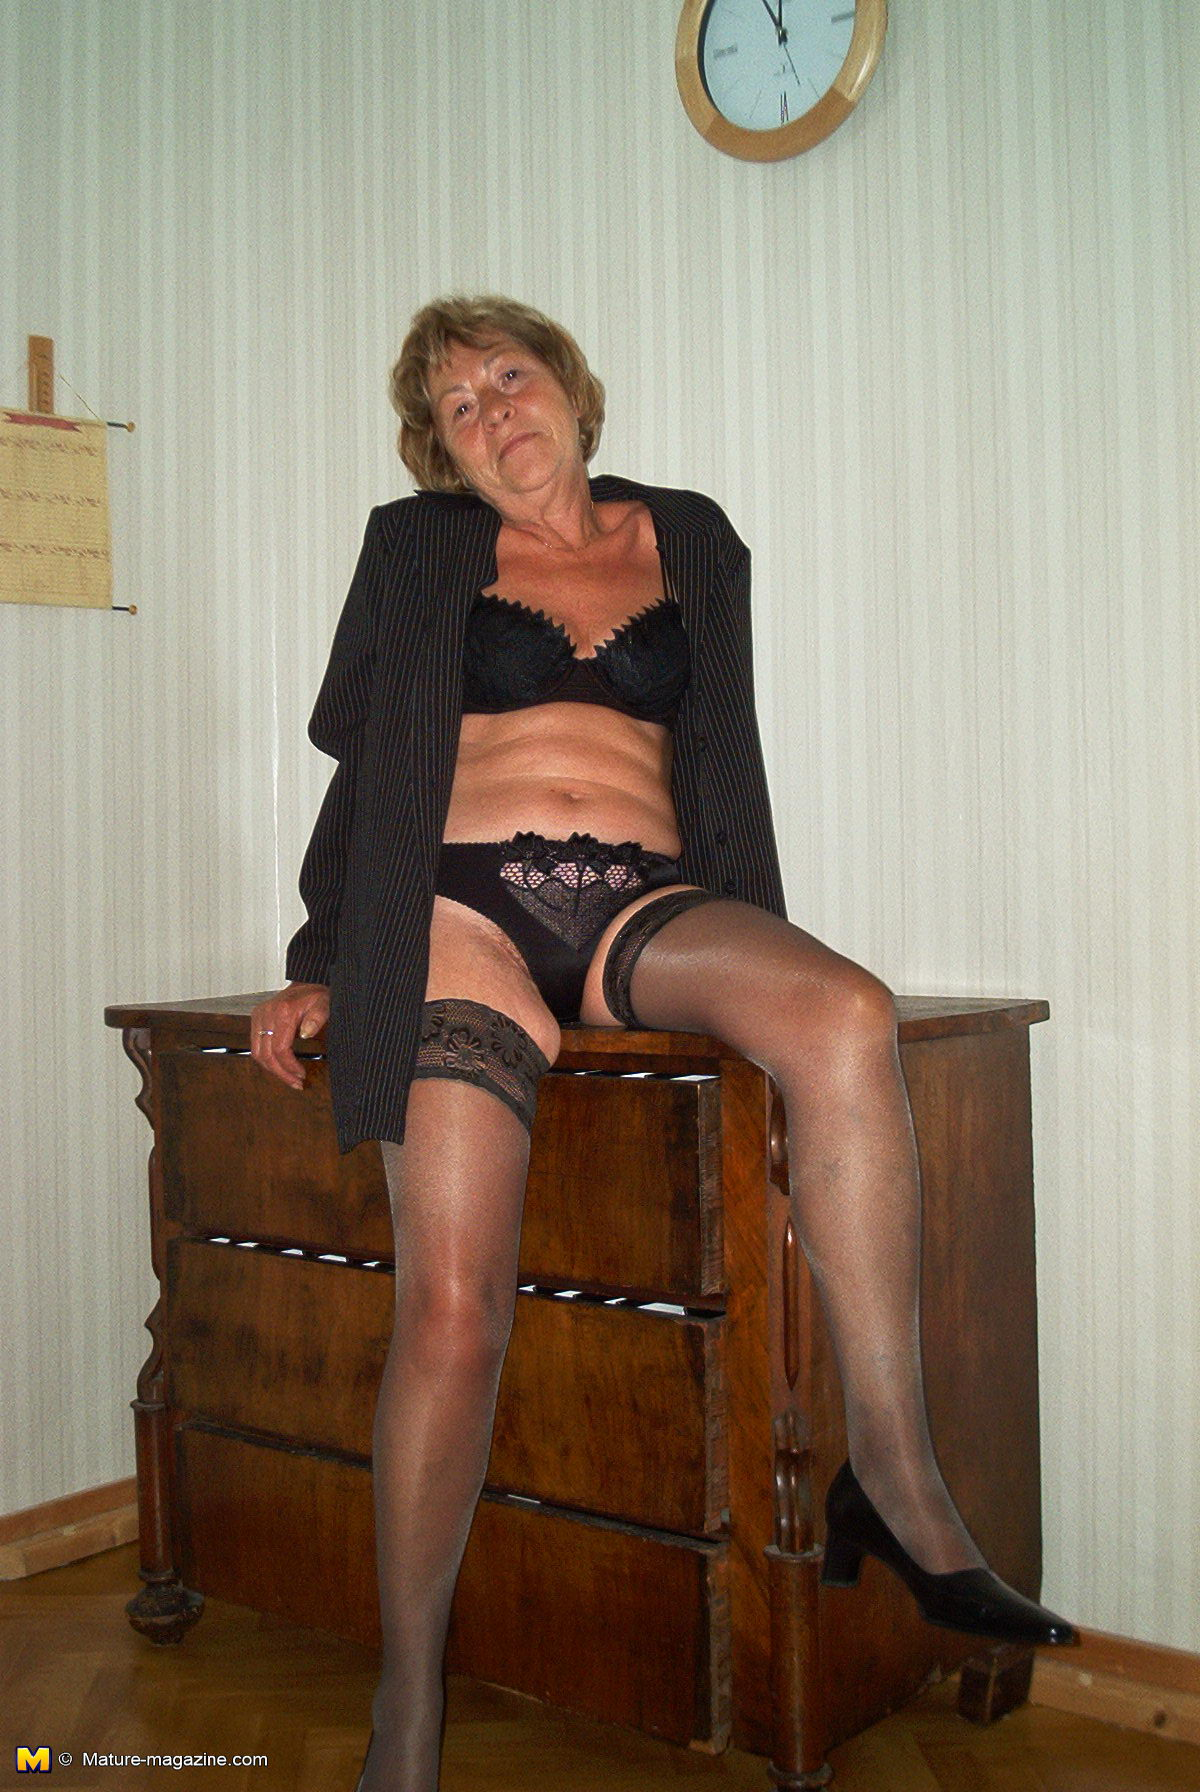 Girl sex granny posing for camera